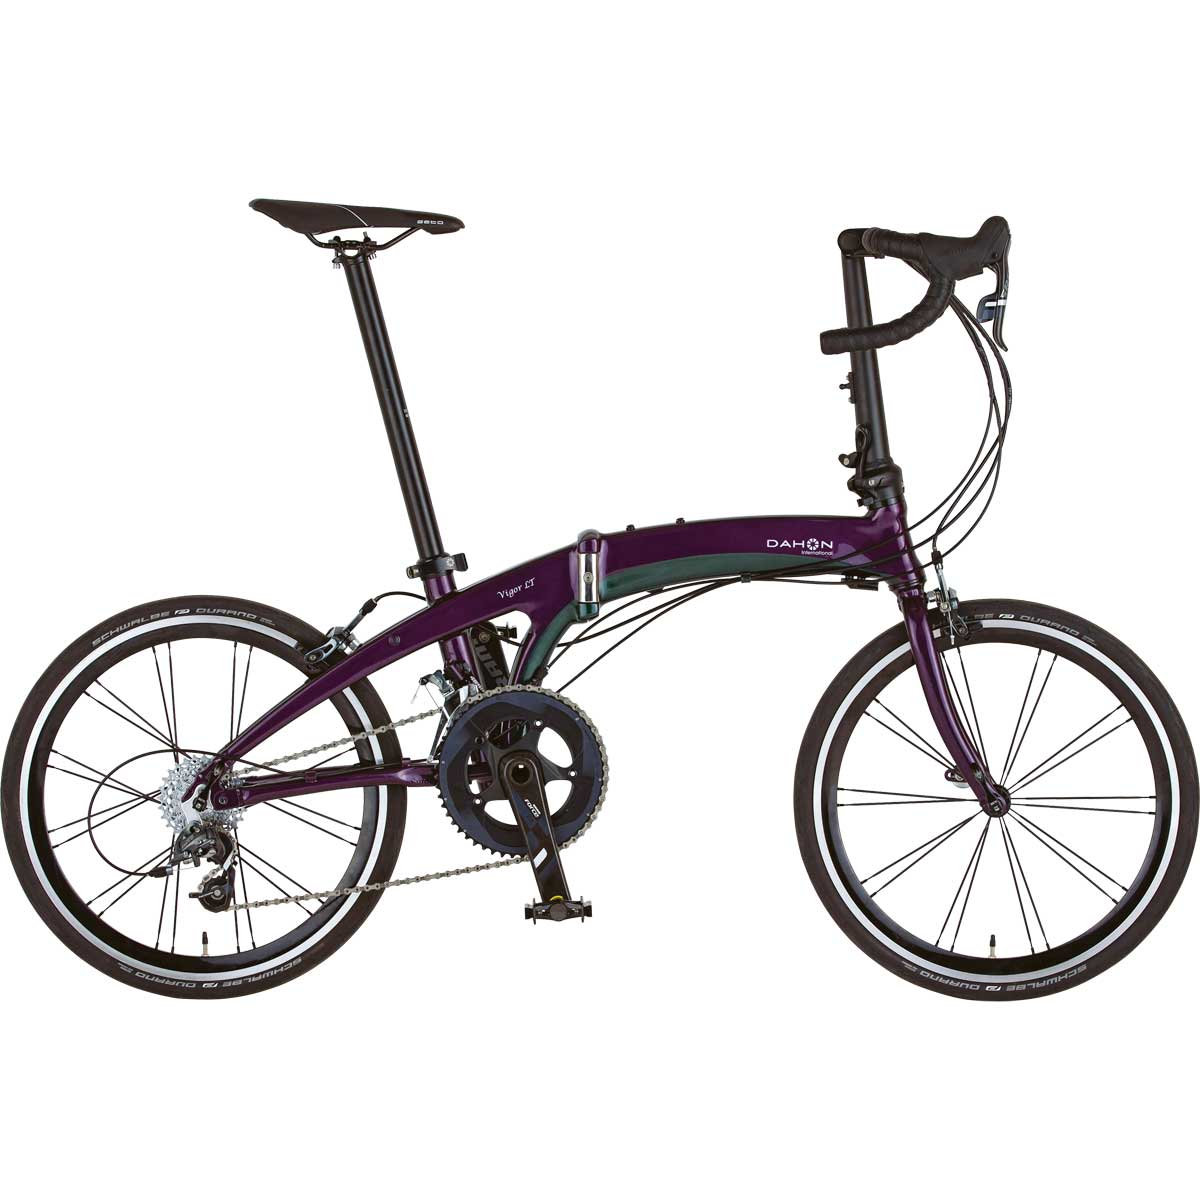 DAHON/ダホンVigorLTヴィガーLTオーロラ(9021)折りたたみ自転車自転車本体